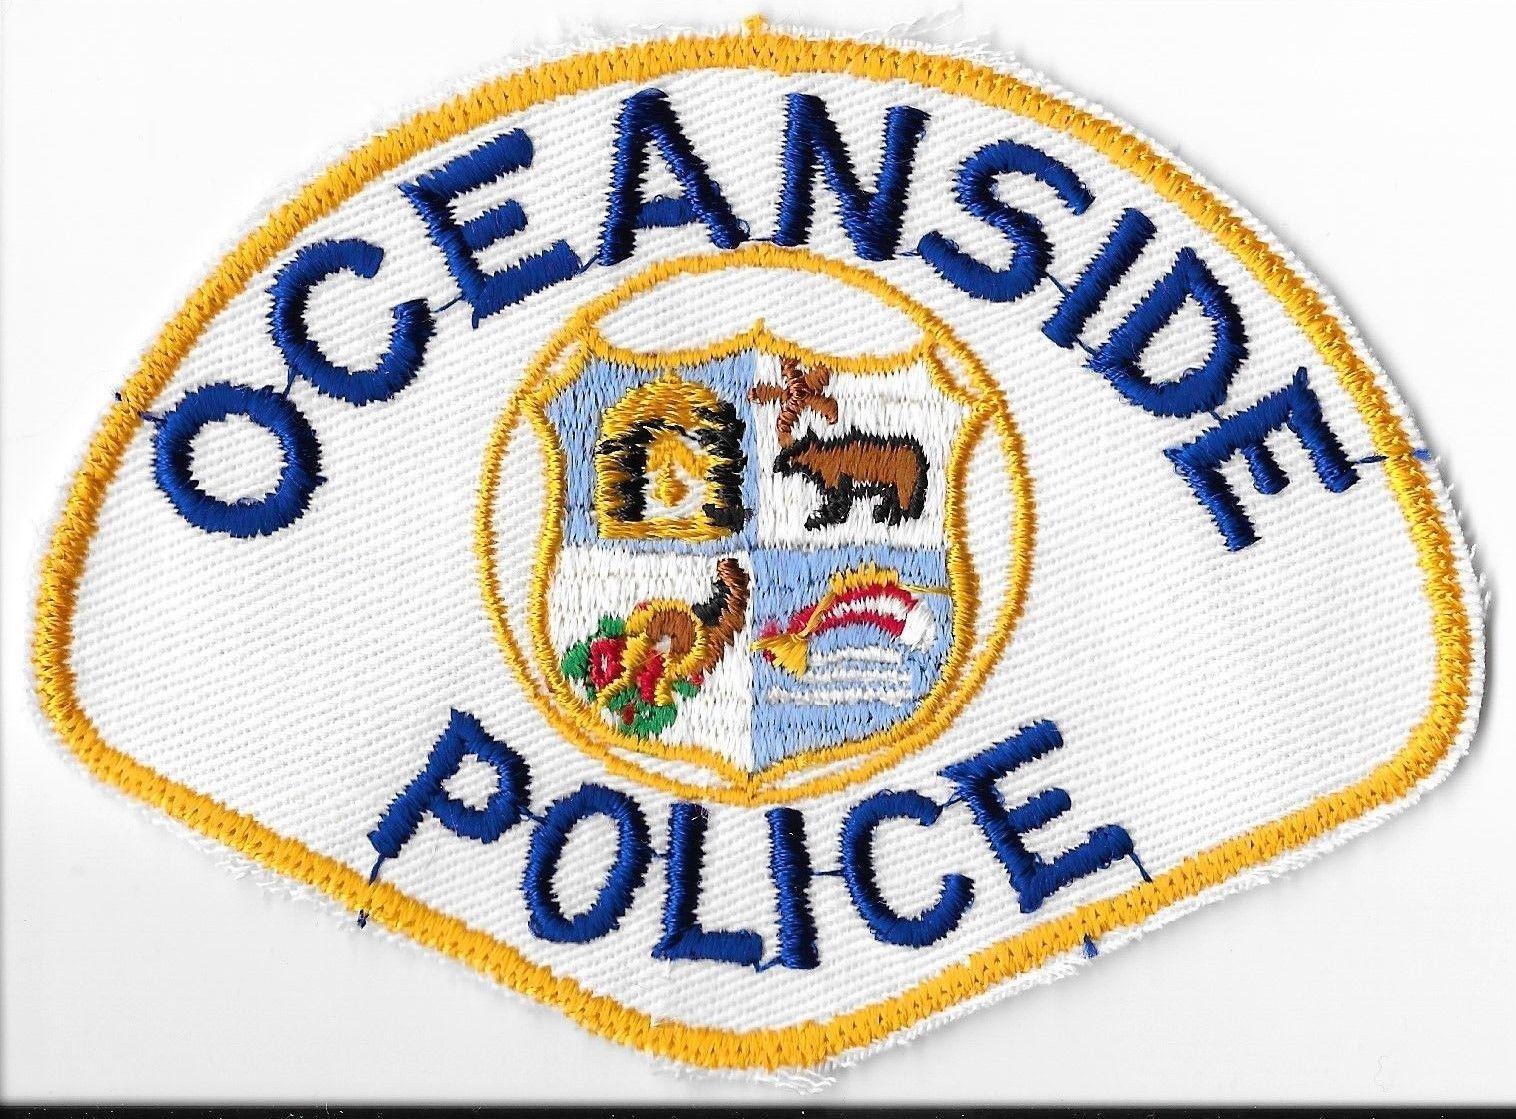 Oceanside California Police Department Shoulder Patch 7 25 Police Police Department Patches